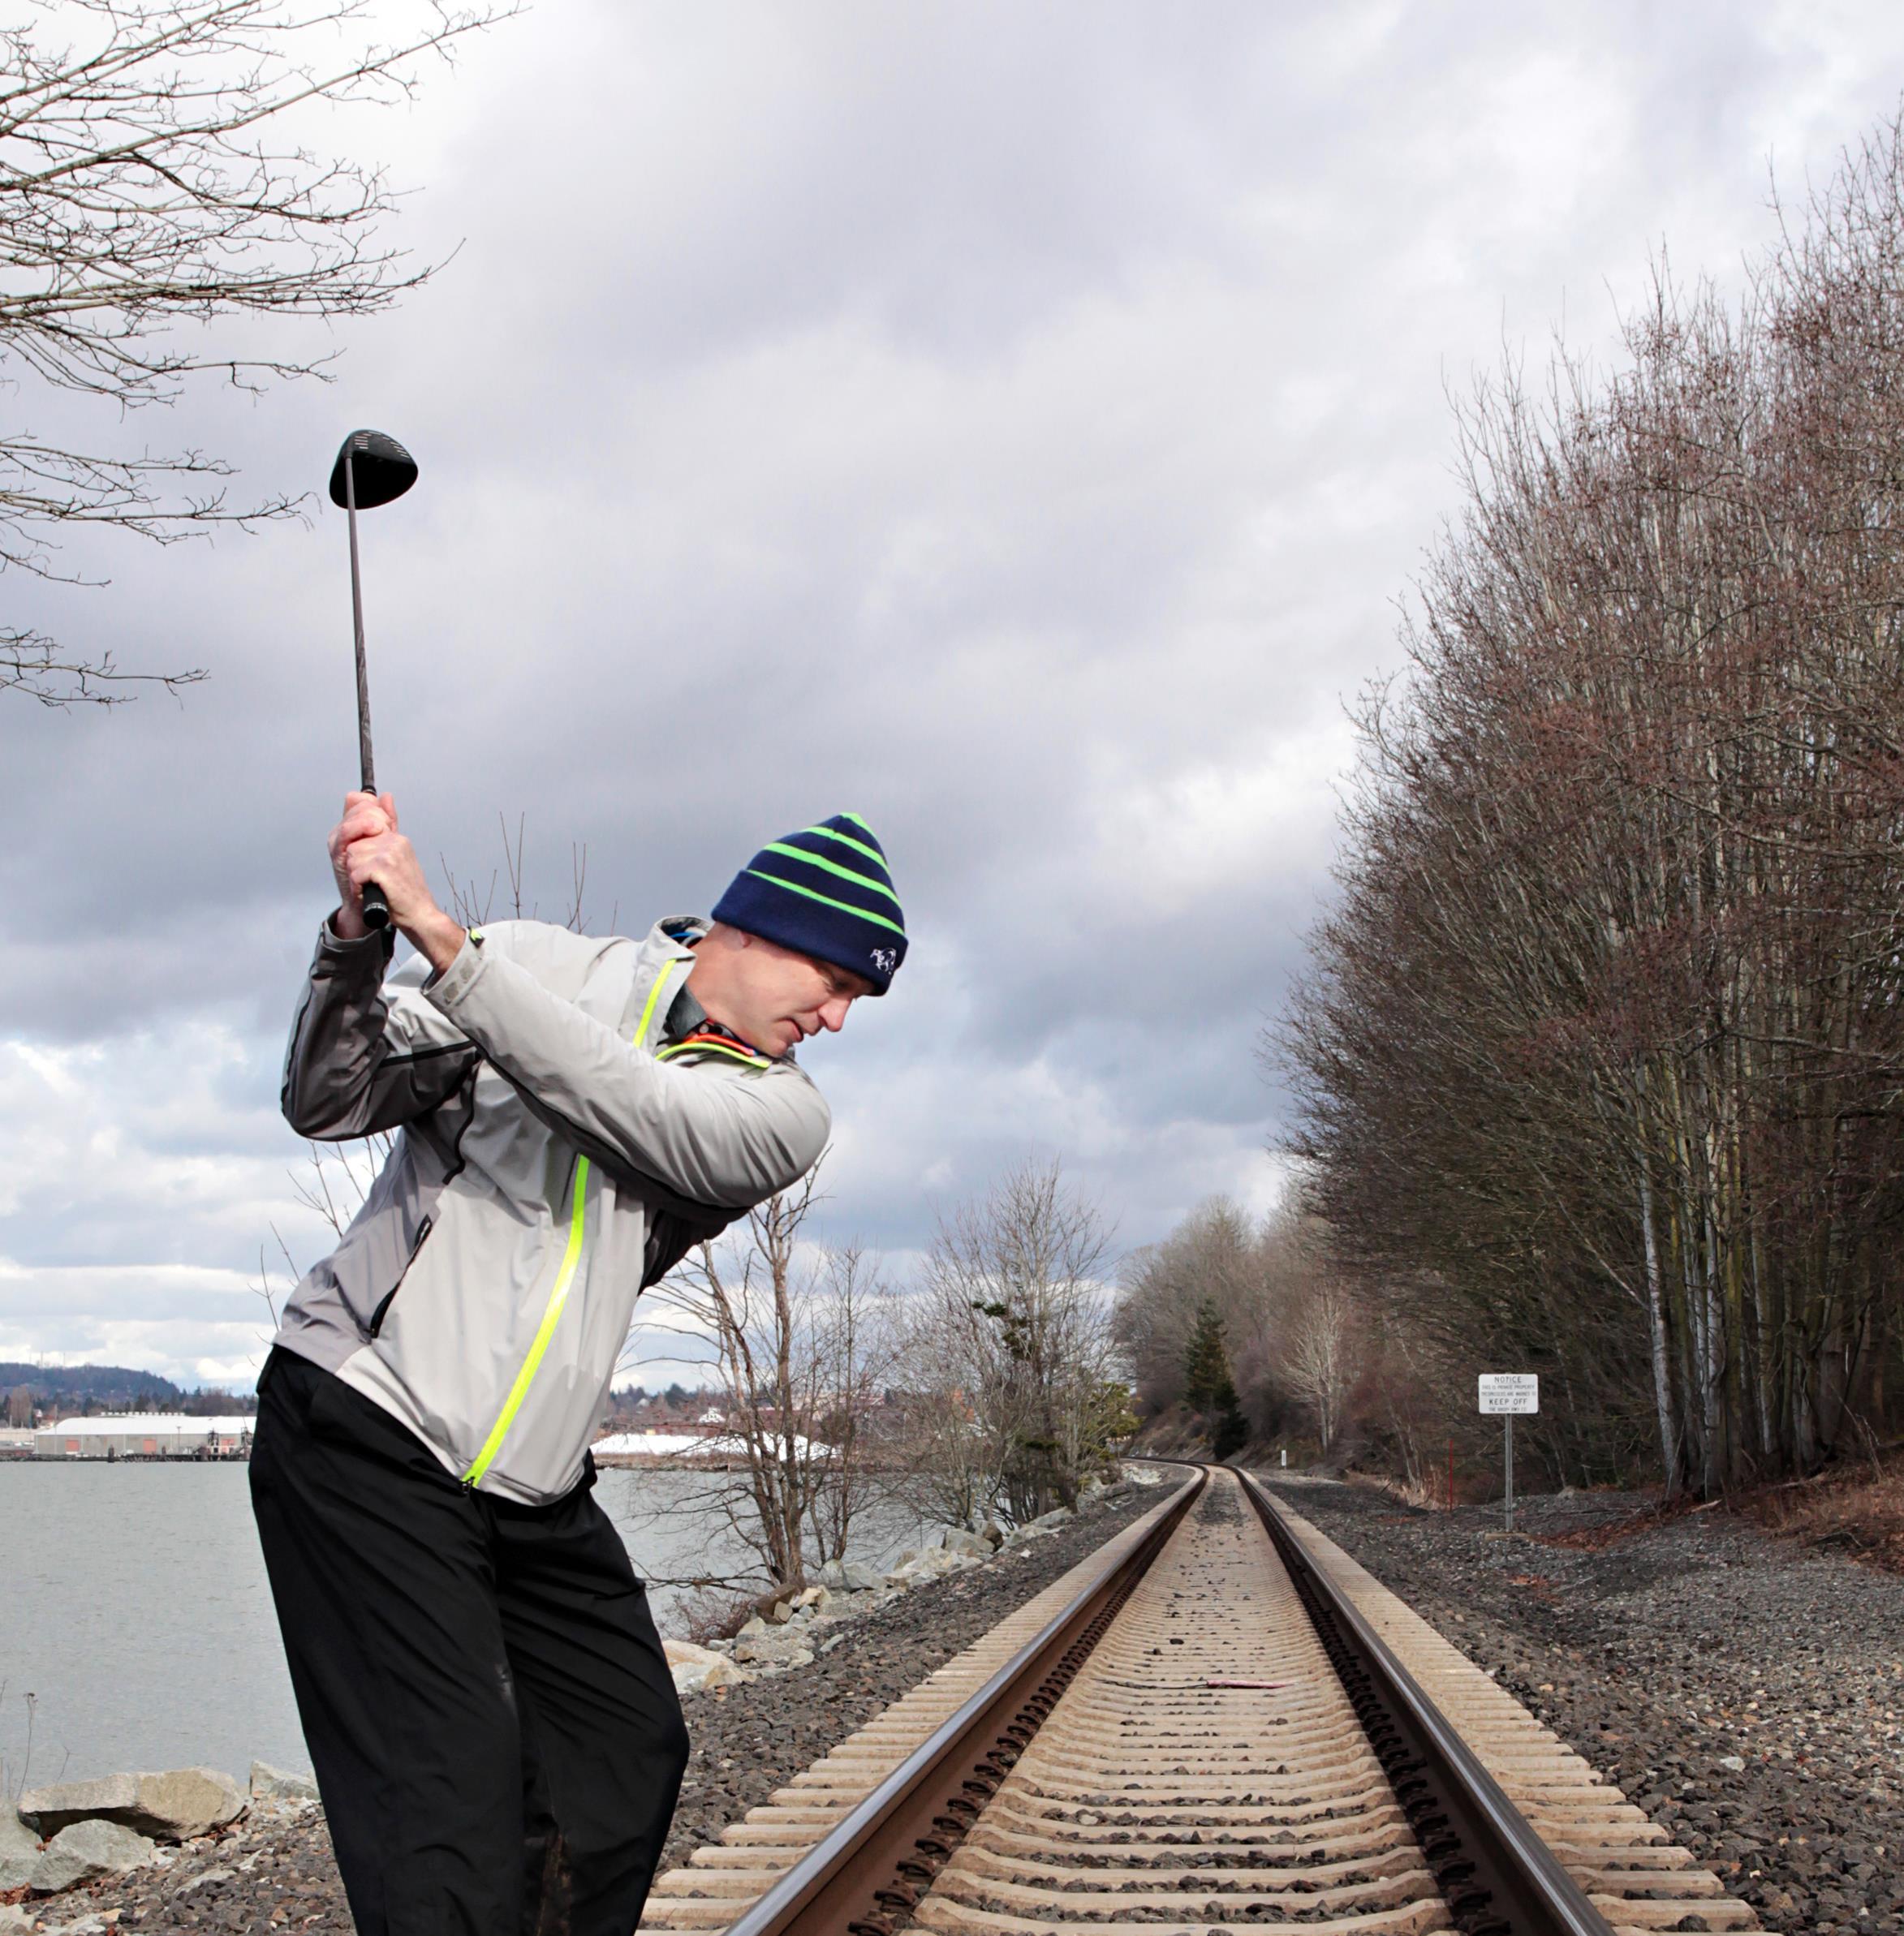 Brian Weeda golfing on the train tracks